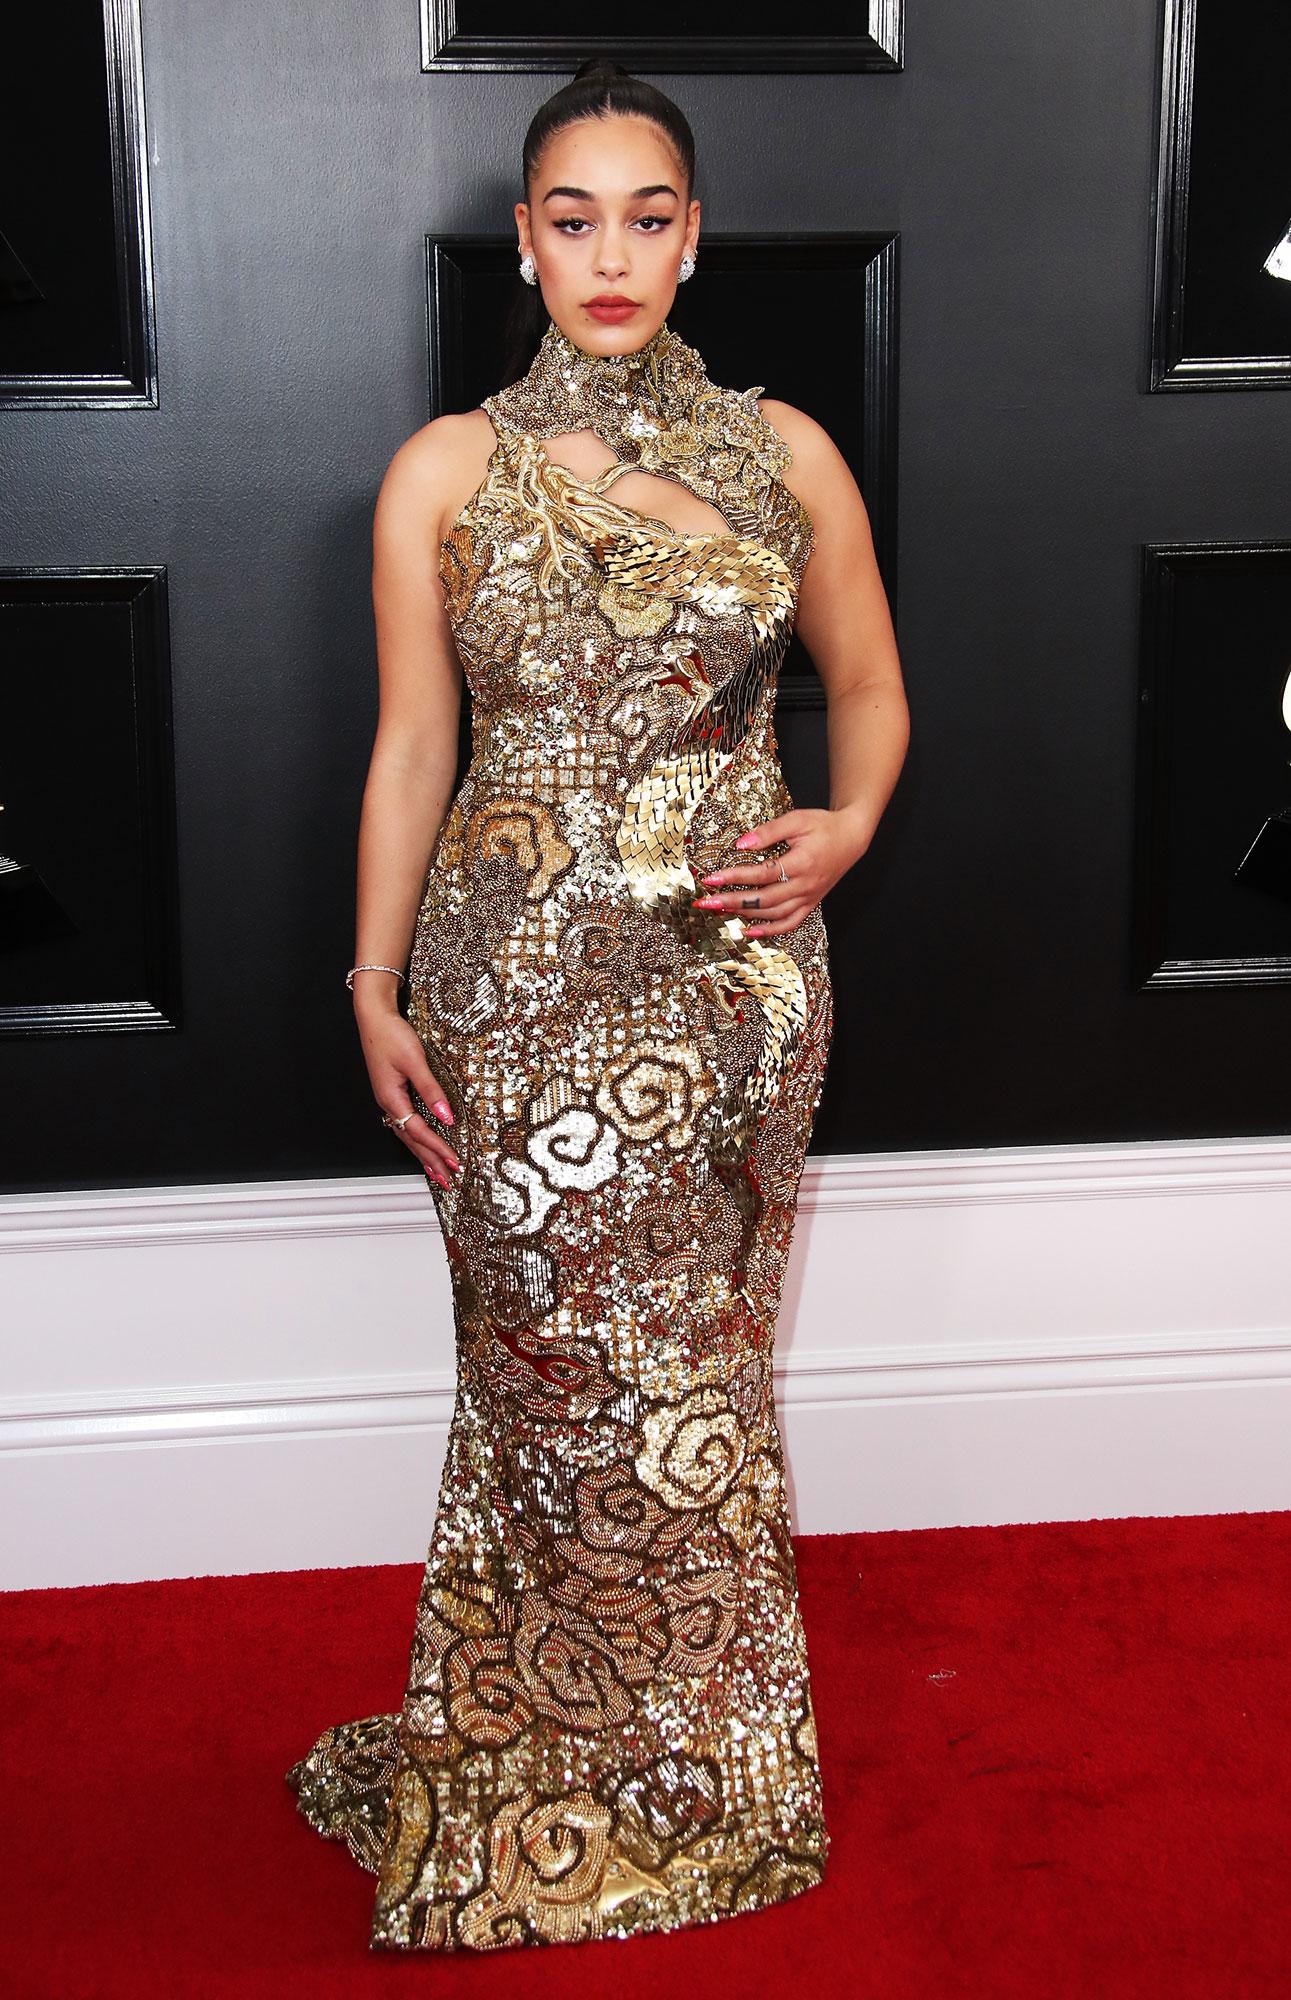 Jorja Smith stylish gold - In a custom sequin Balmain on Feb. 10.